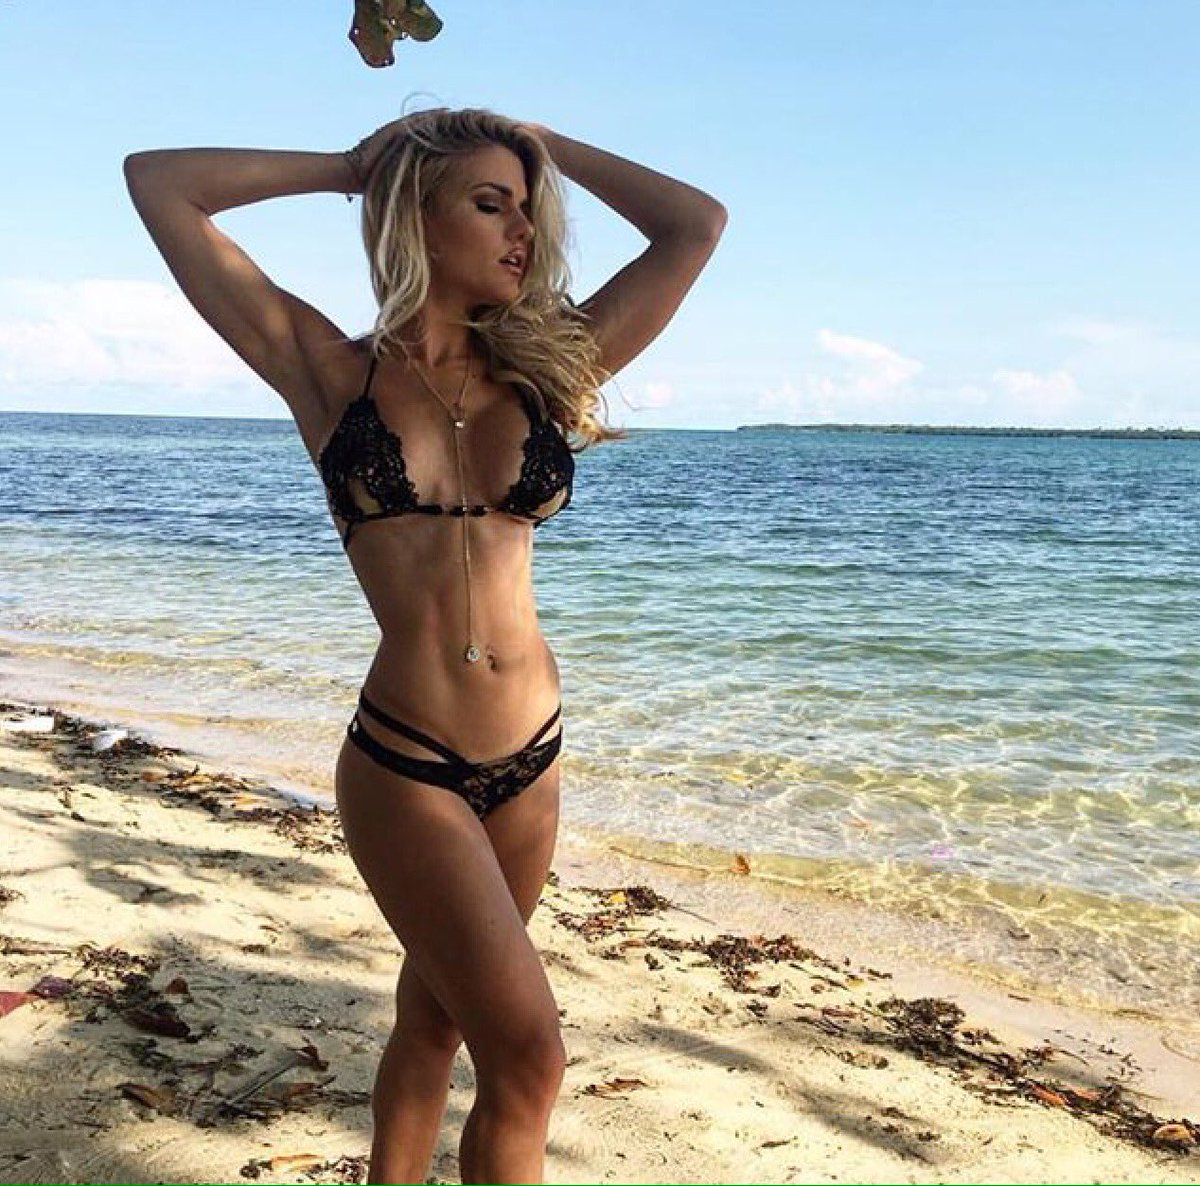 Snapchat Marissa Everhart nudes (41 photos), Sexy